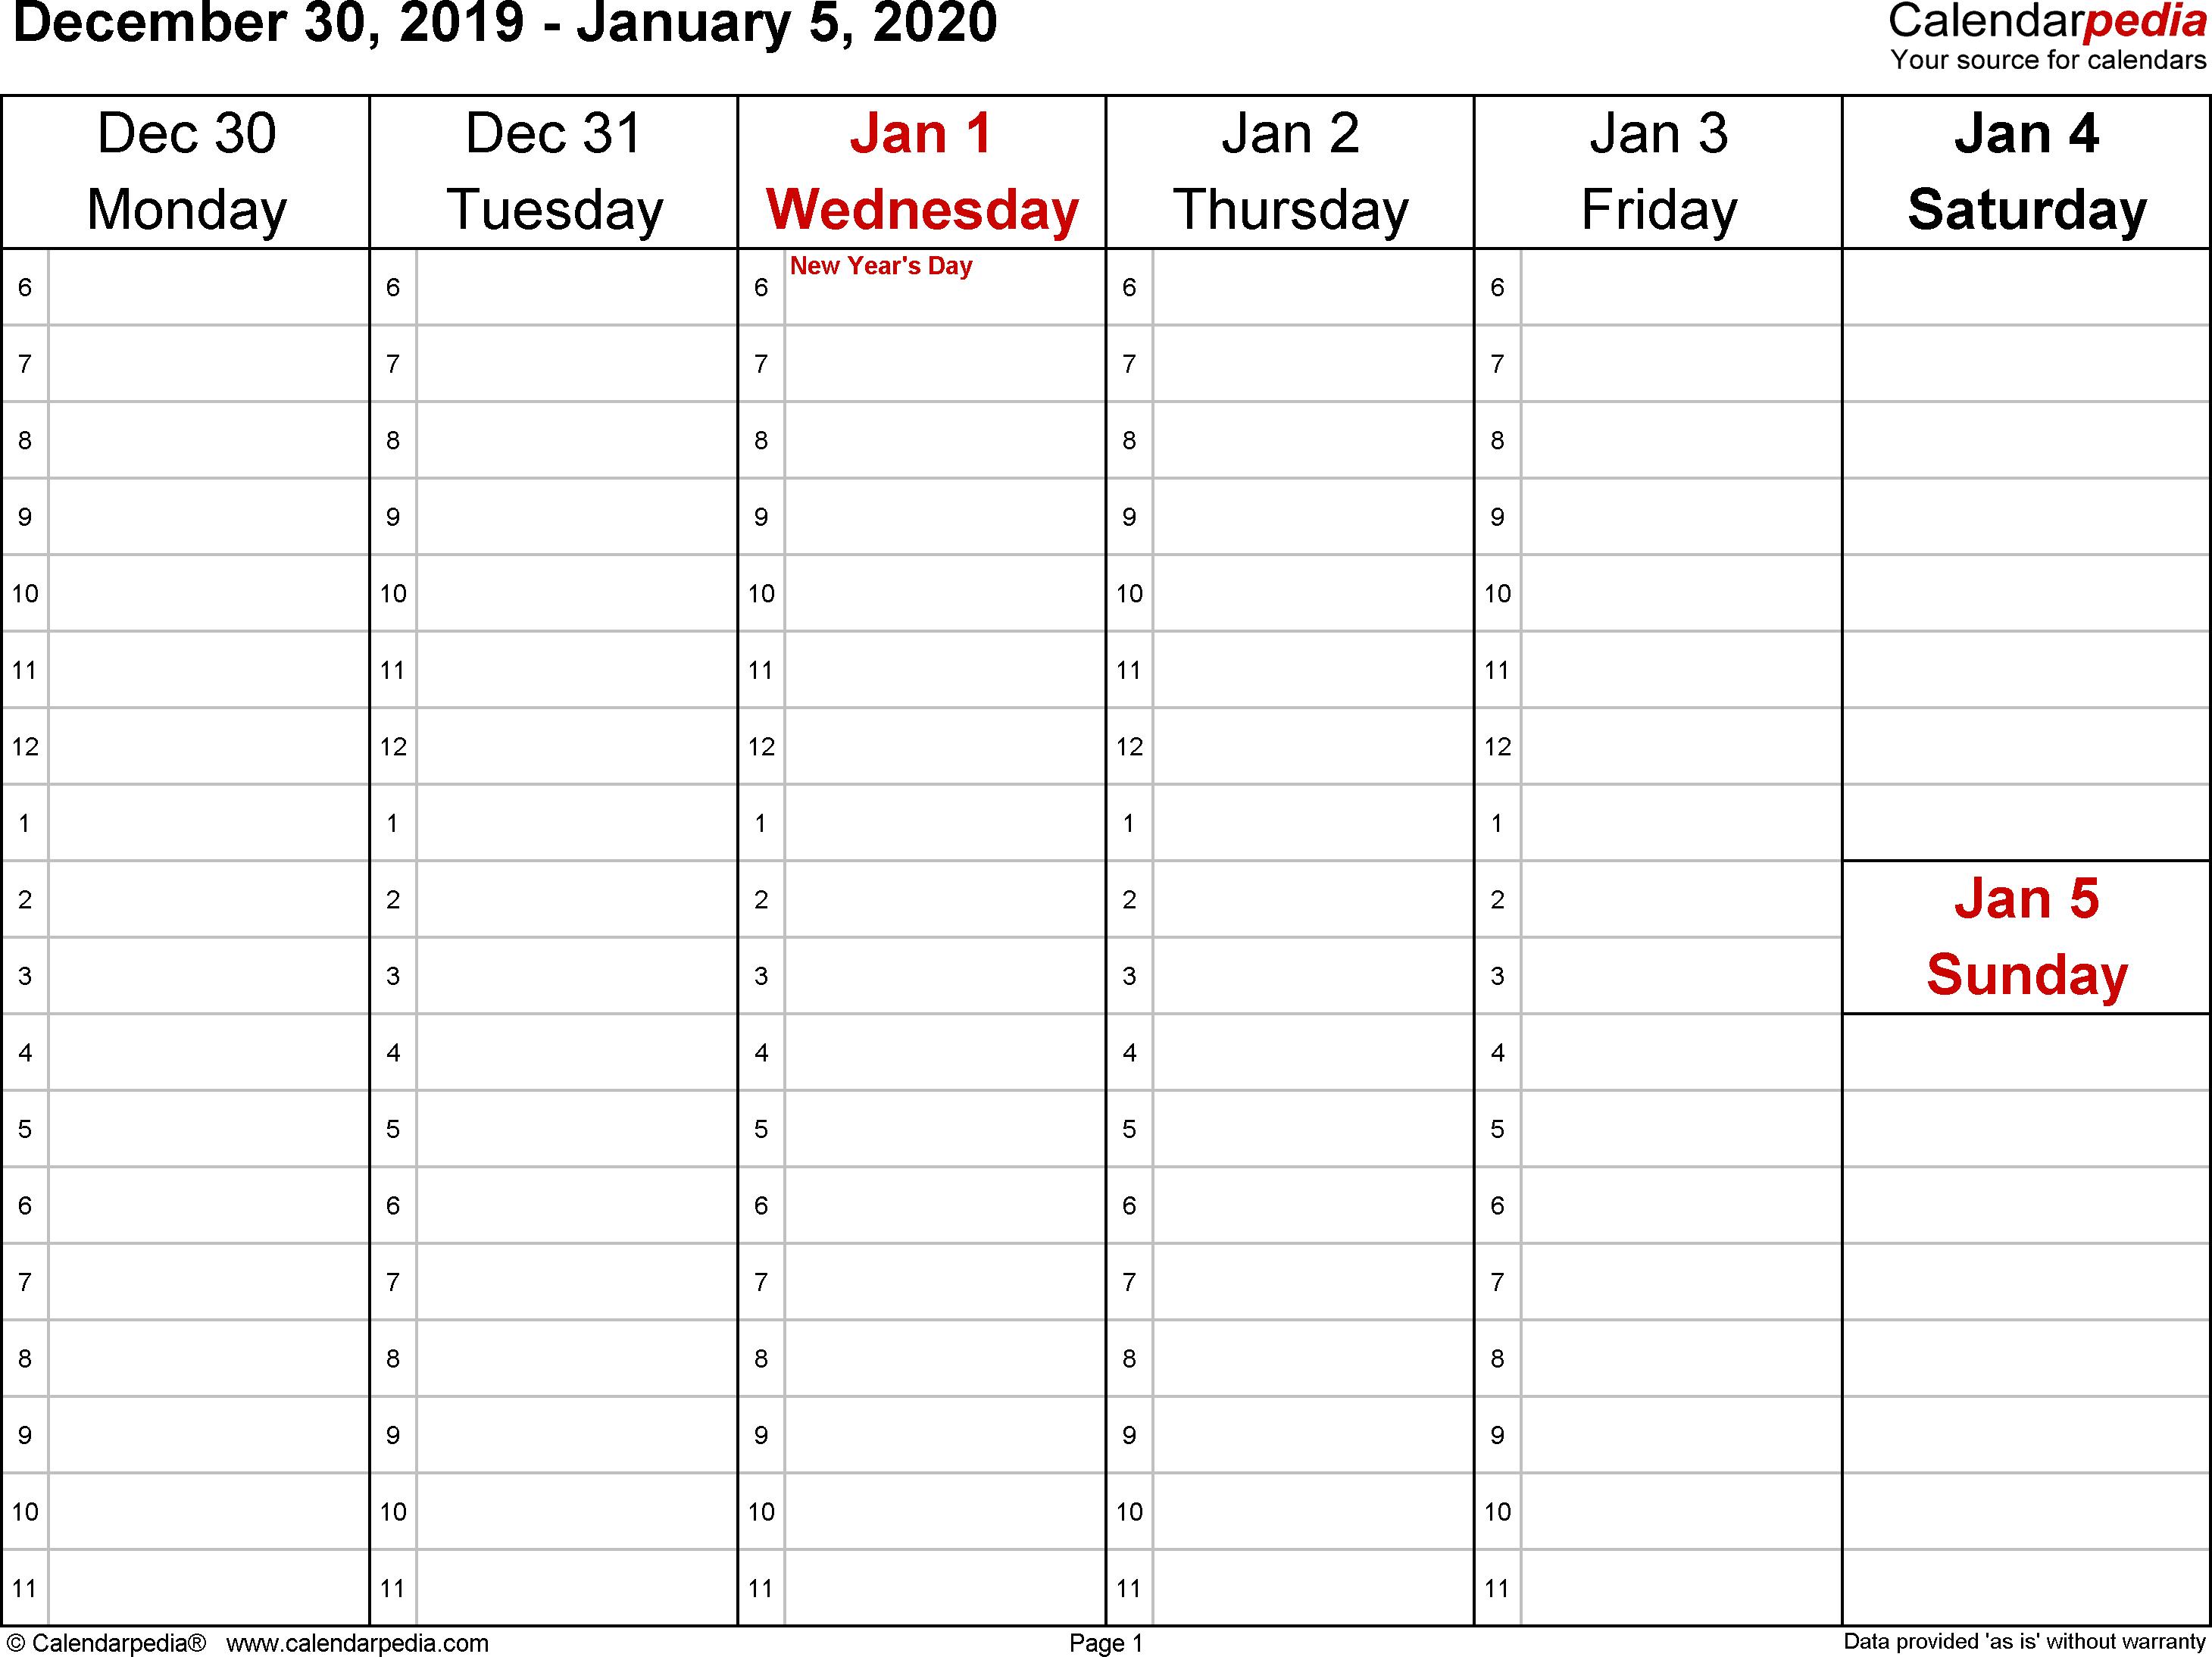 Weekly Calendar Printable 2020 - Wpa.wpart.co